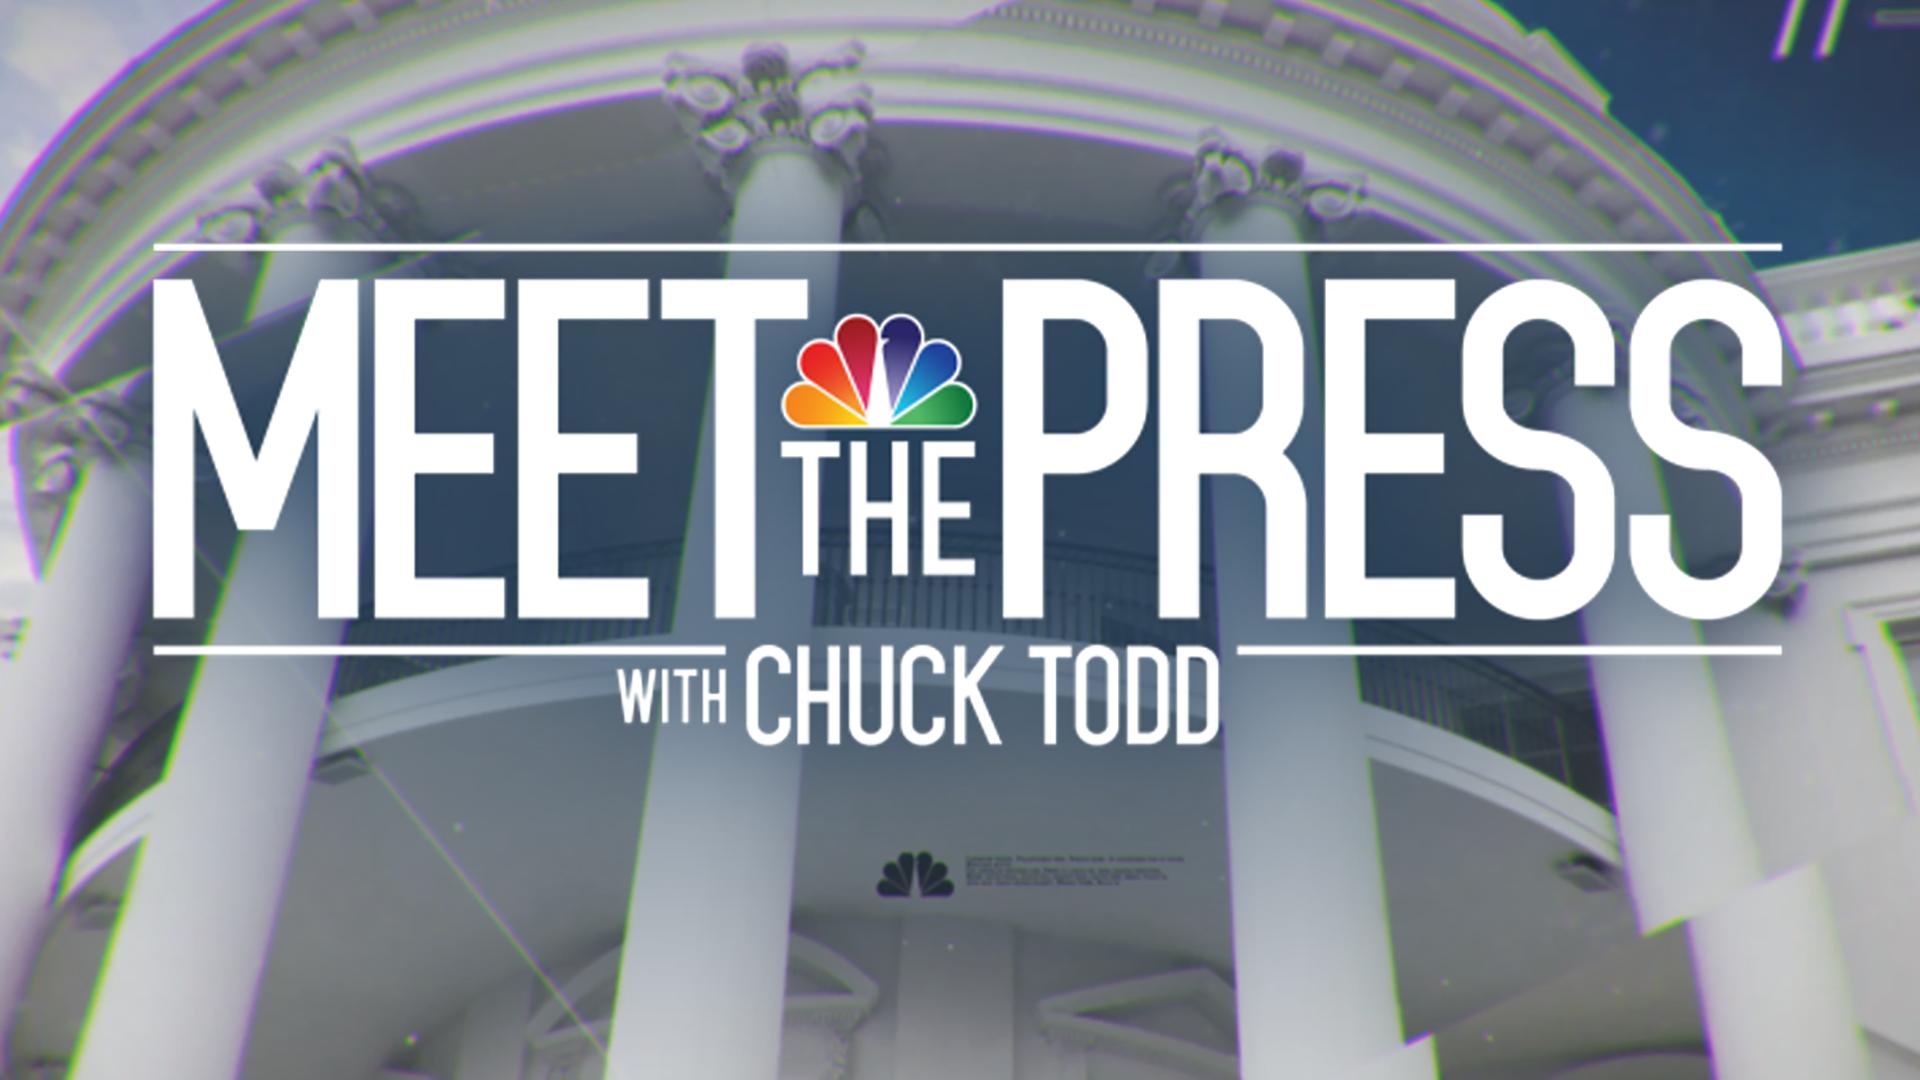 Meet the Press - March 11, 2018